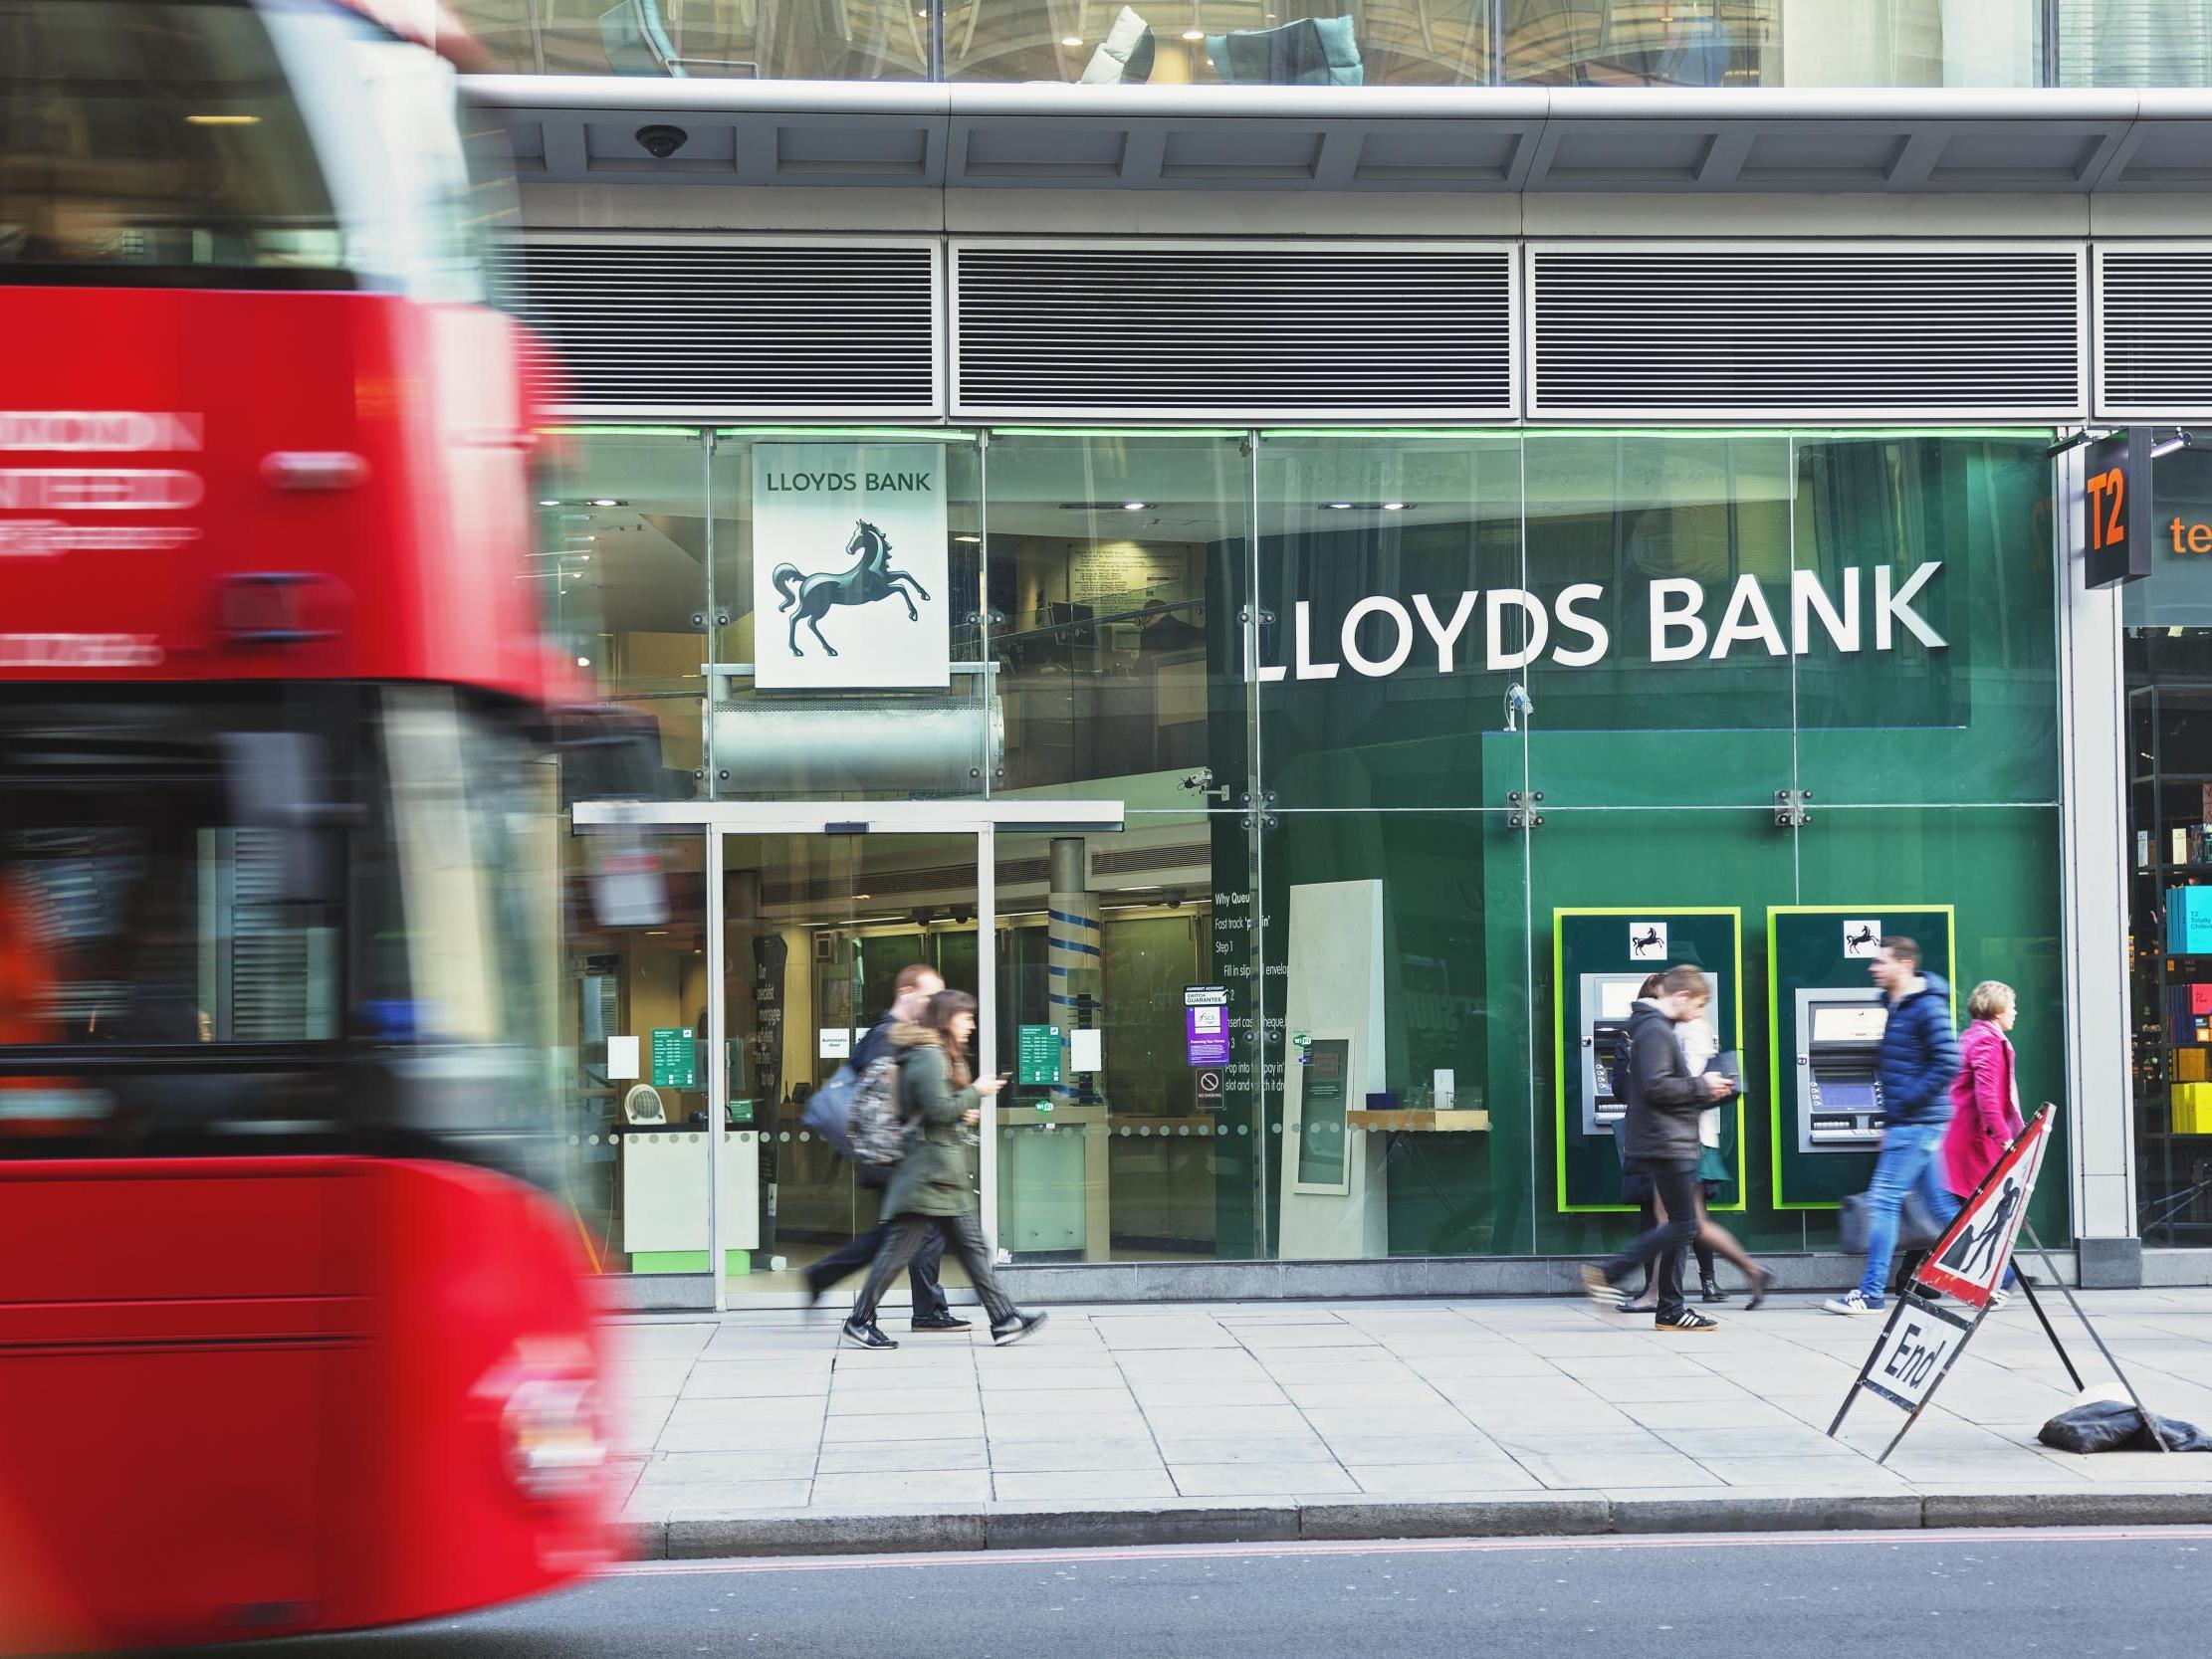 Coronavirus: TSB, Lloyds, Barclays and HSBC offer interest-free overdrafts to help struggling customers